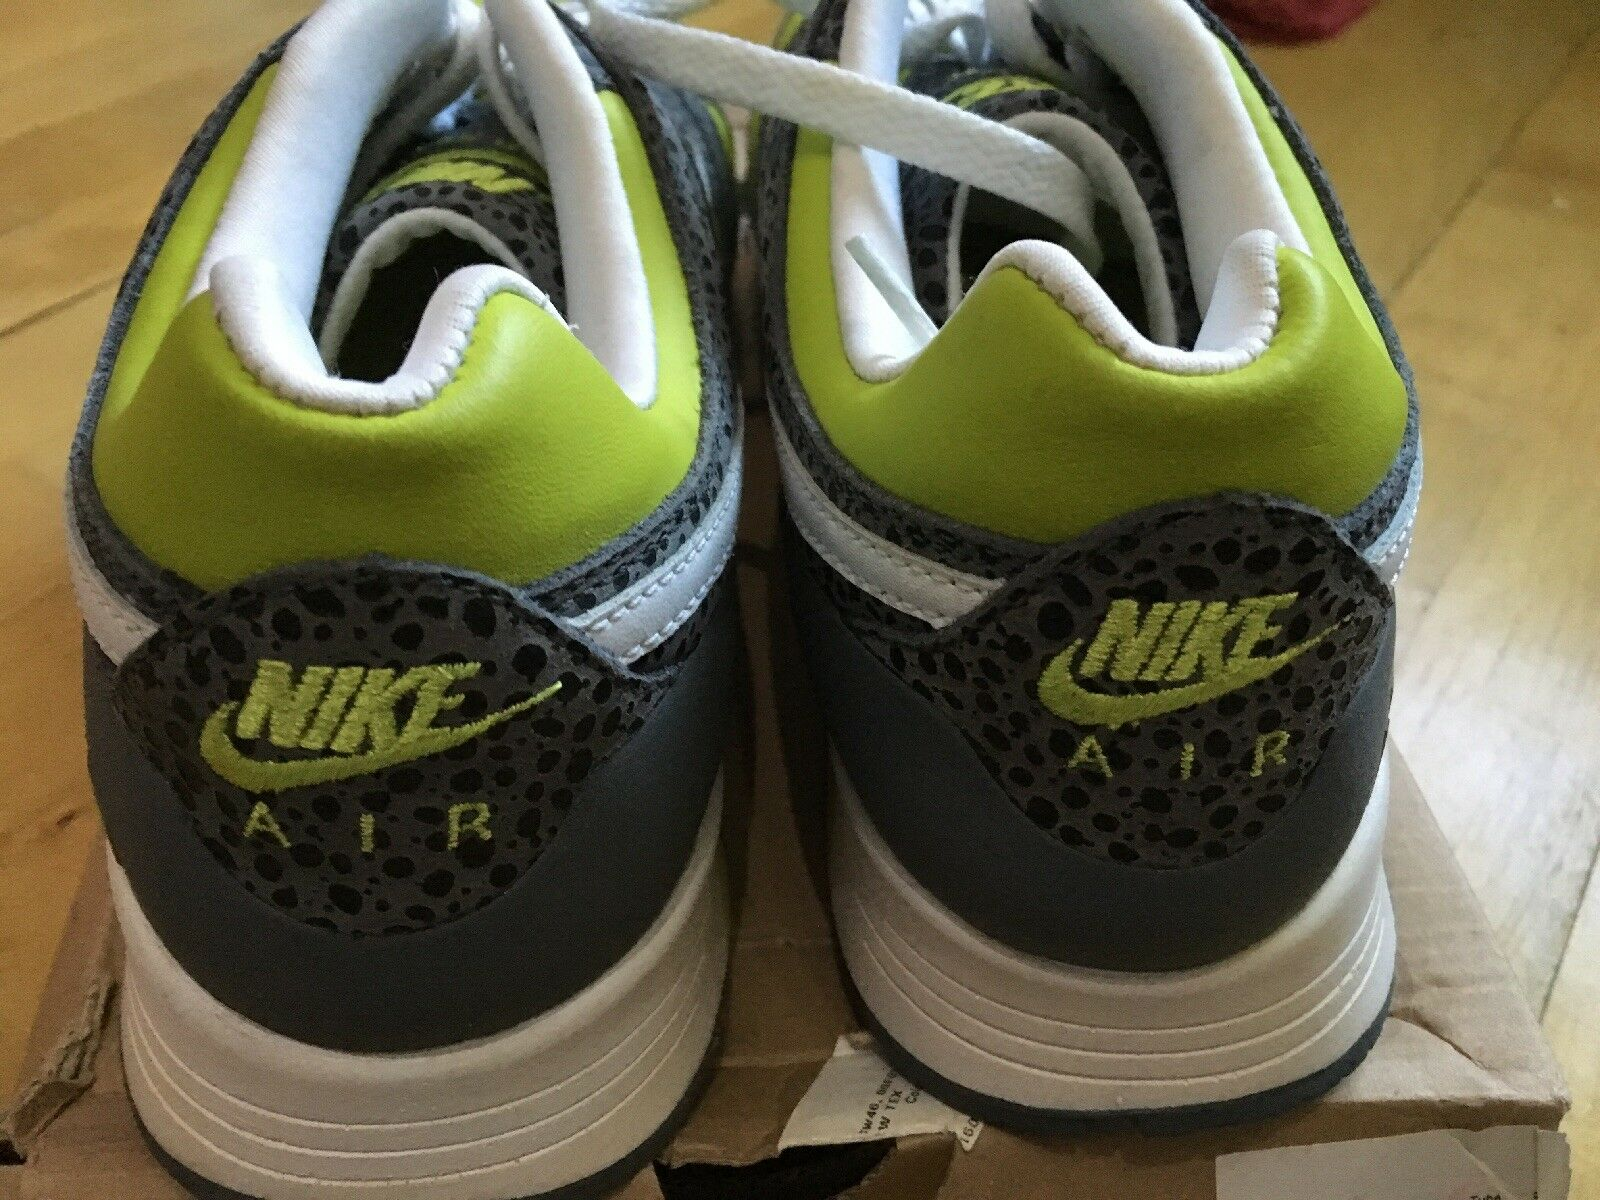 Nike Stab 2007 verde blancooo Air Flint Reino Unido 8 8 8 7f75af